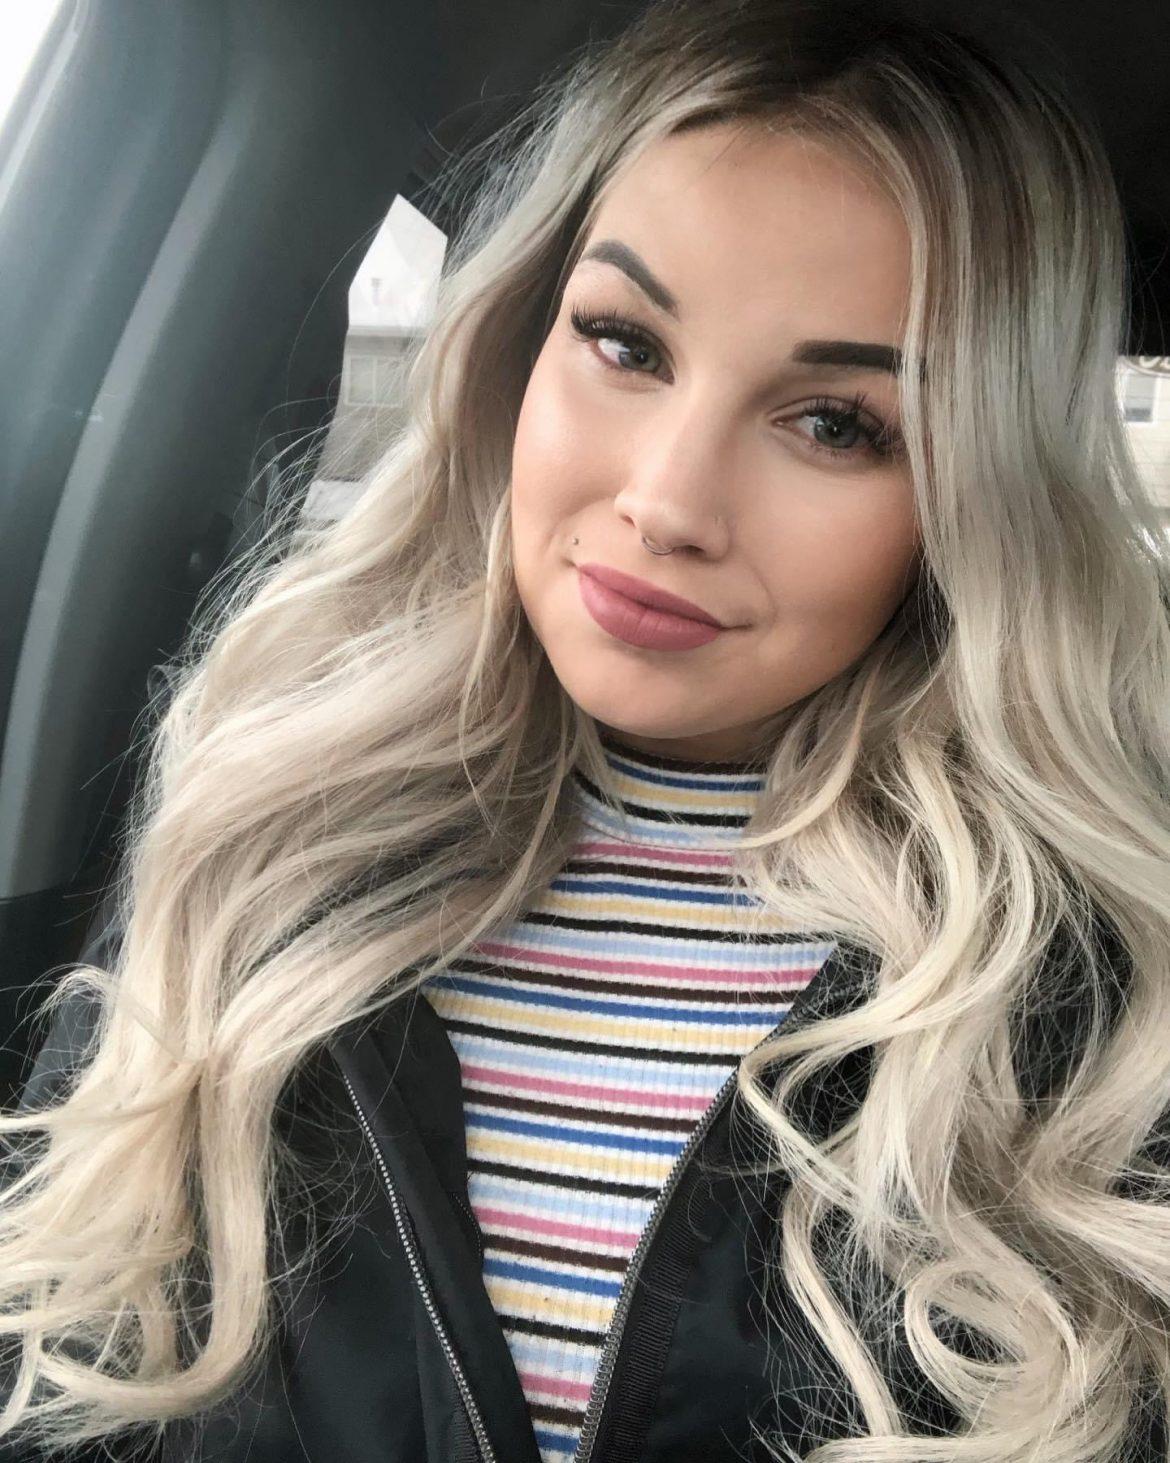 Emma Noseworthy